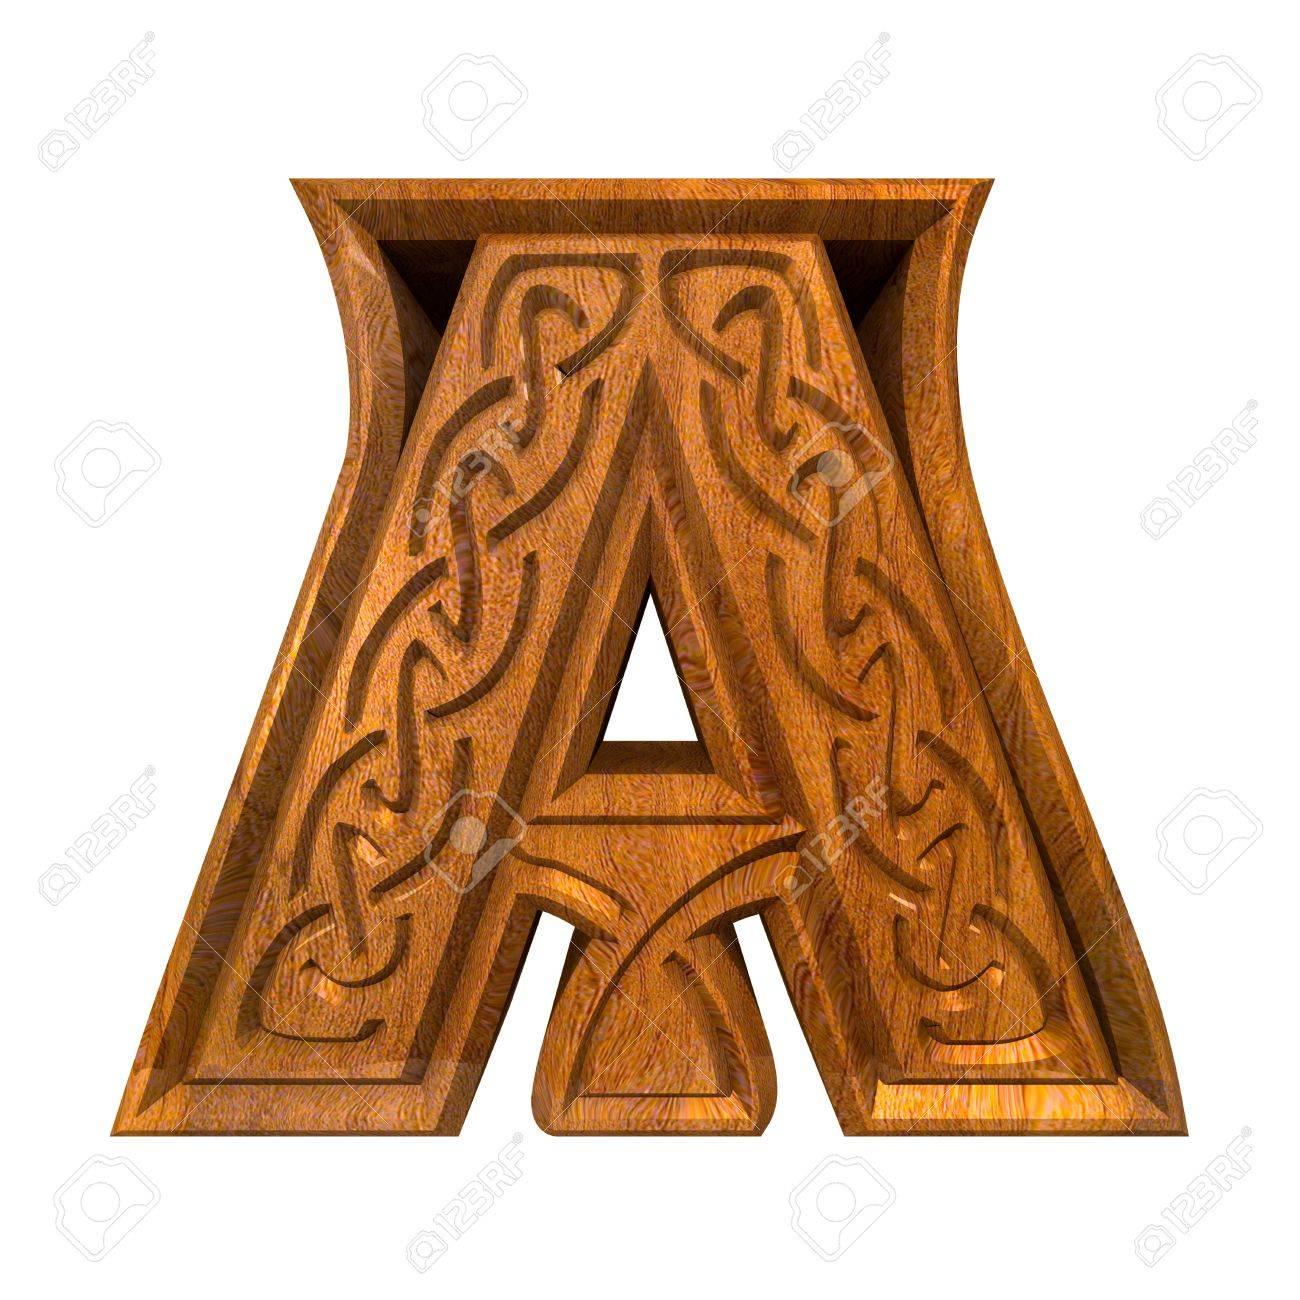 3d made - illustration of Celtic alphabet letter A Stock Illustration - 9293669